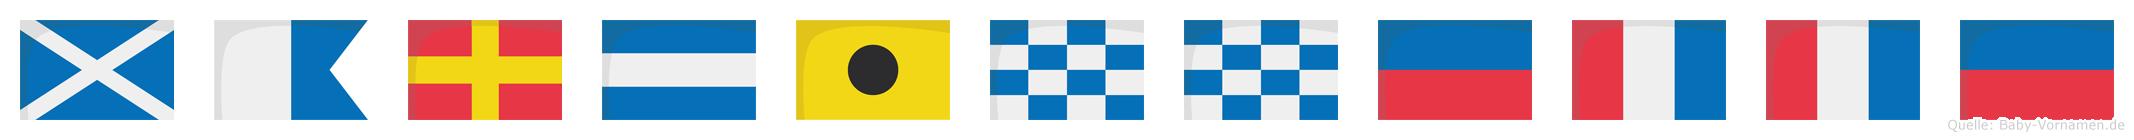 Marjinnette im Flaggenalphabet